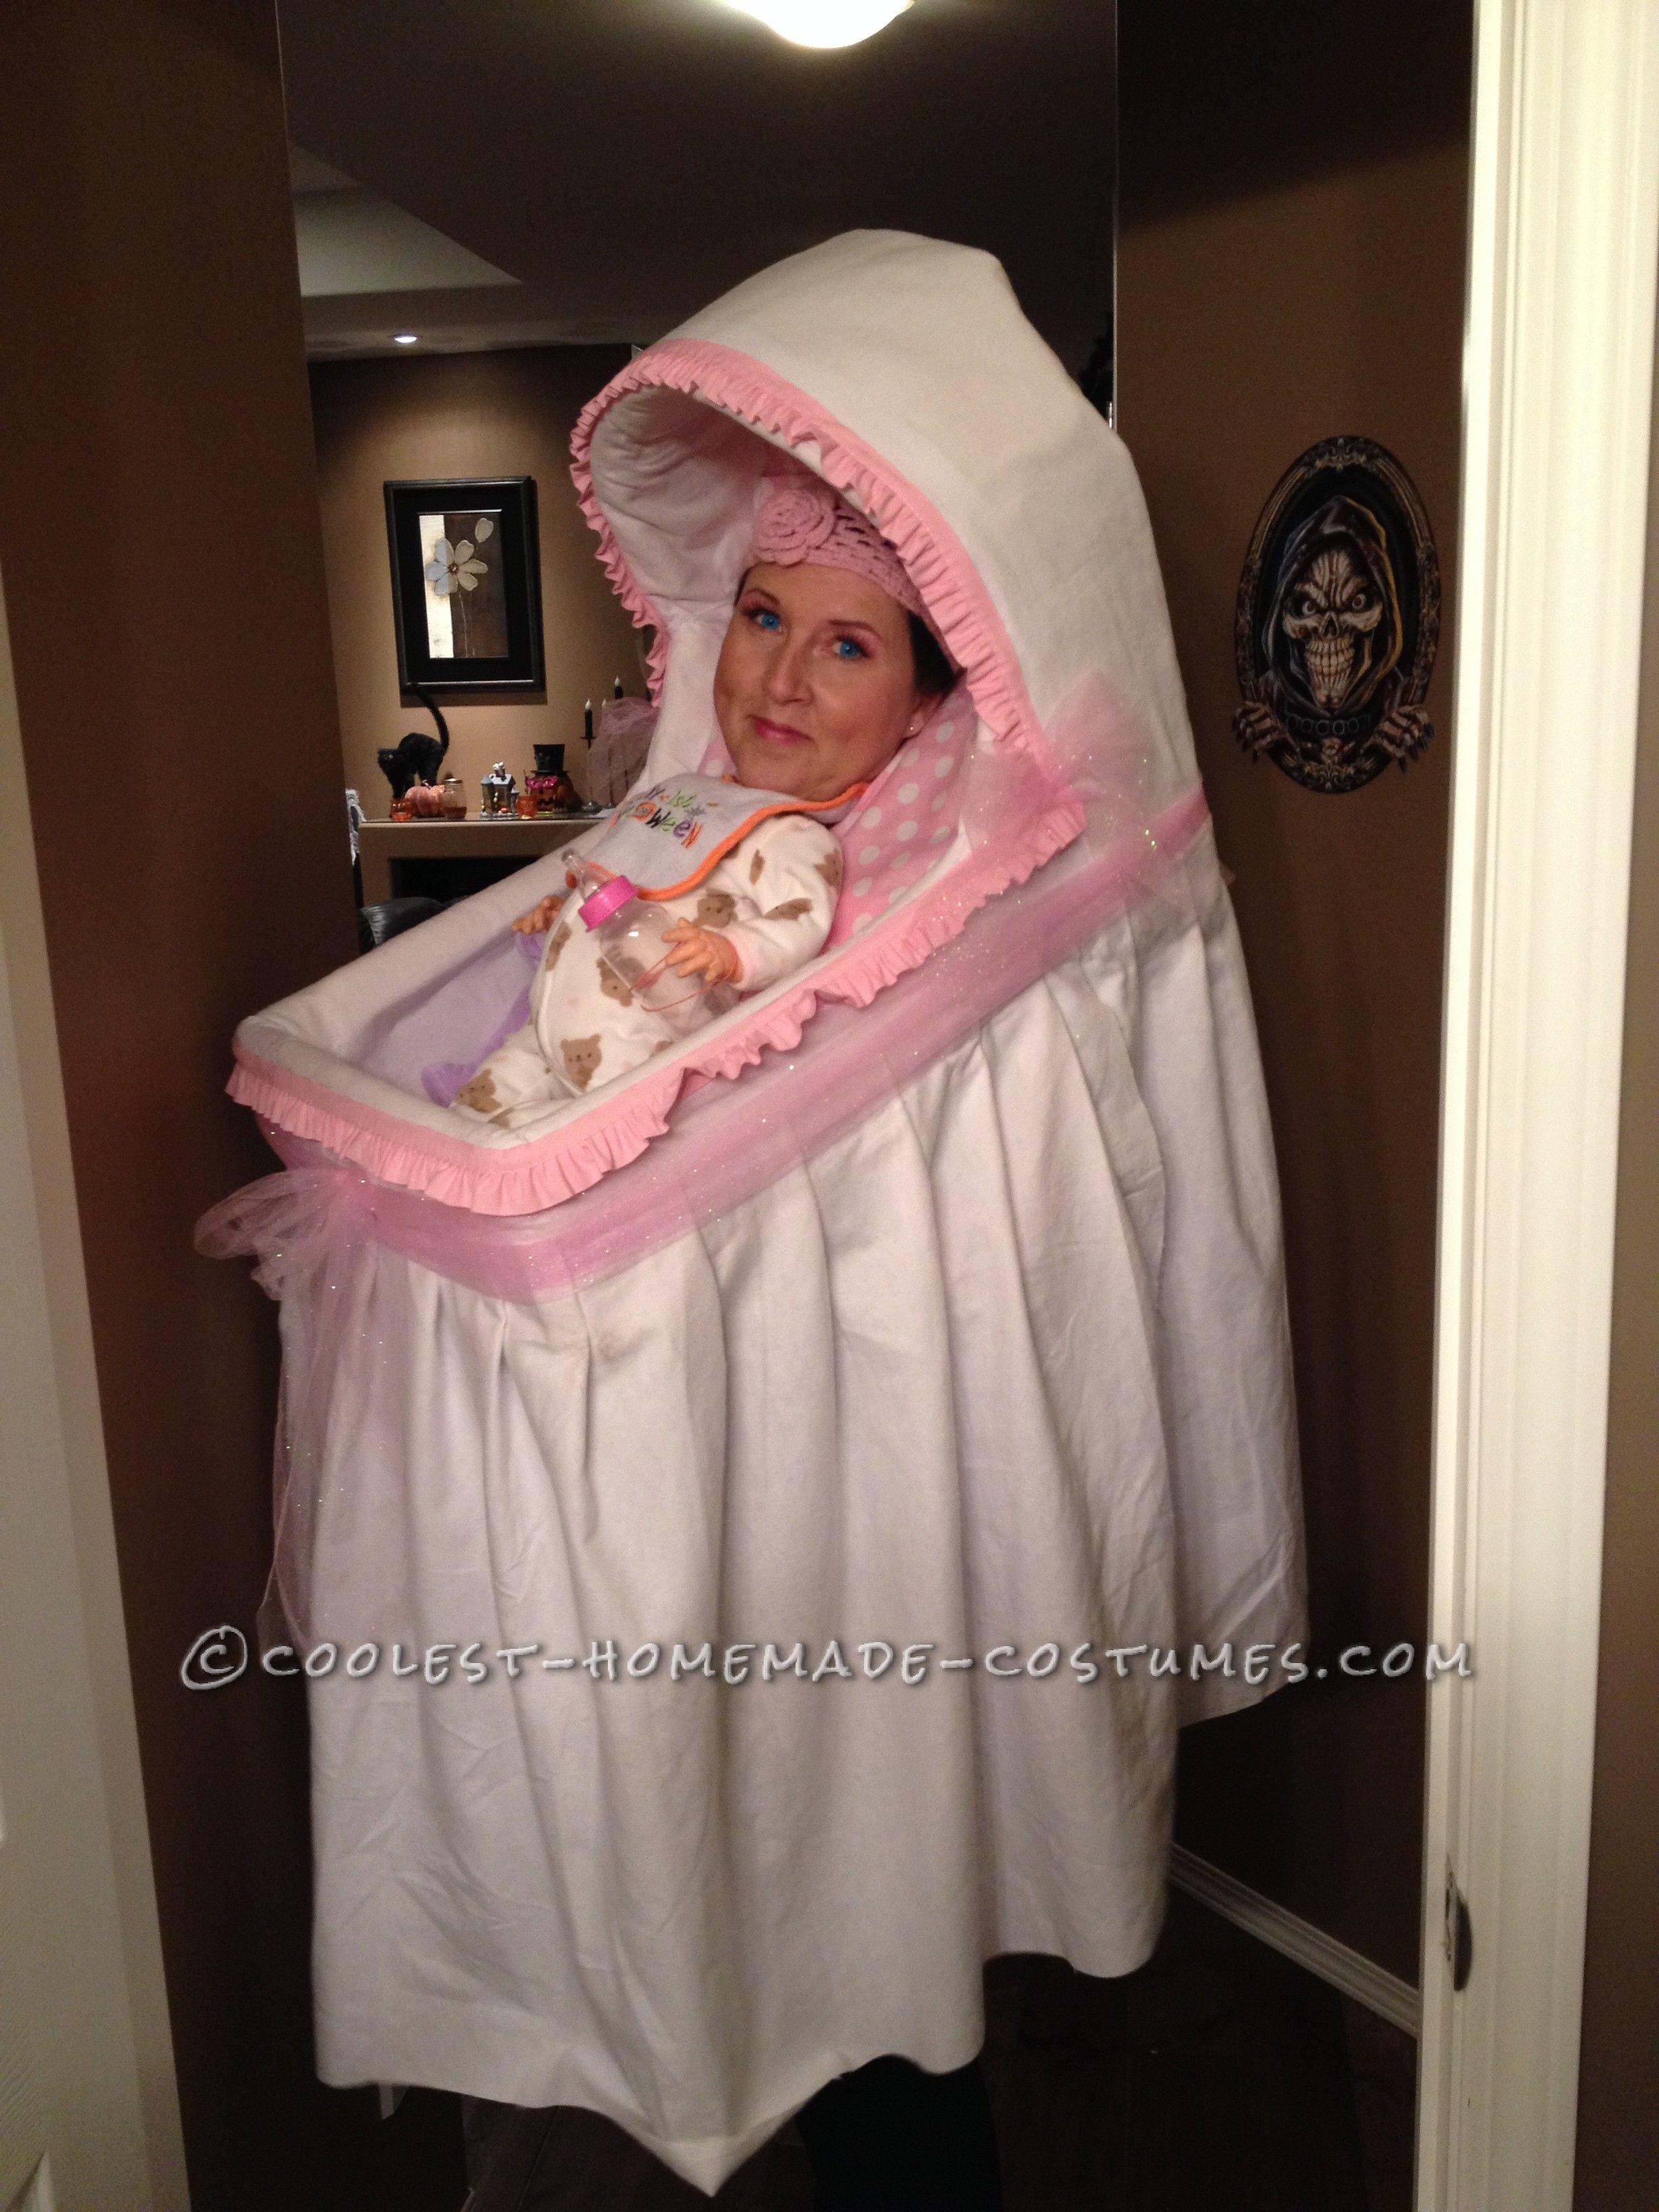 Best Homemade Baby Illusion Costume